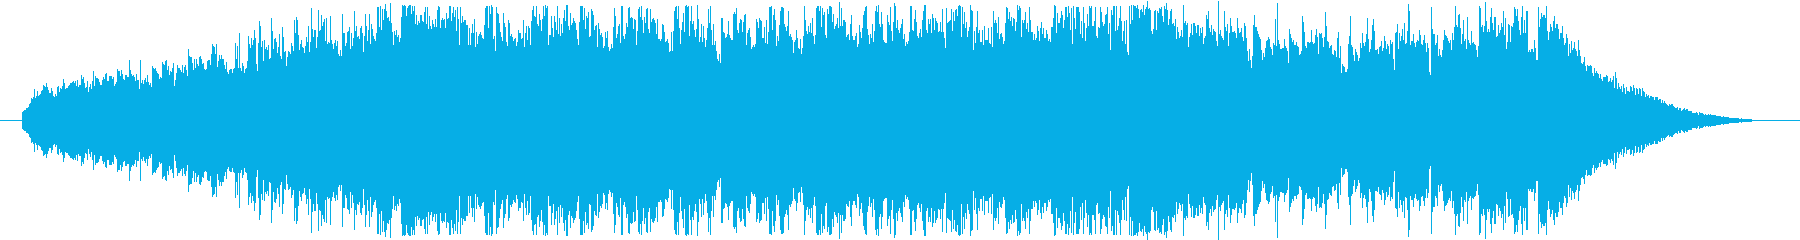 Relaxed CM / Female Bossa Nova's reproduced waveform